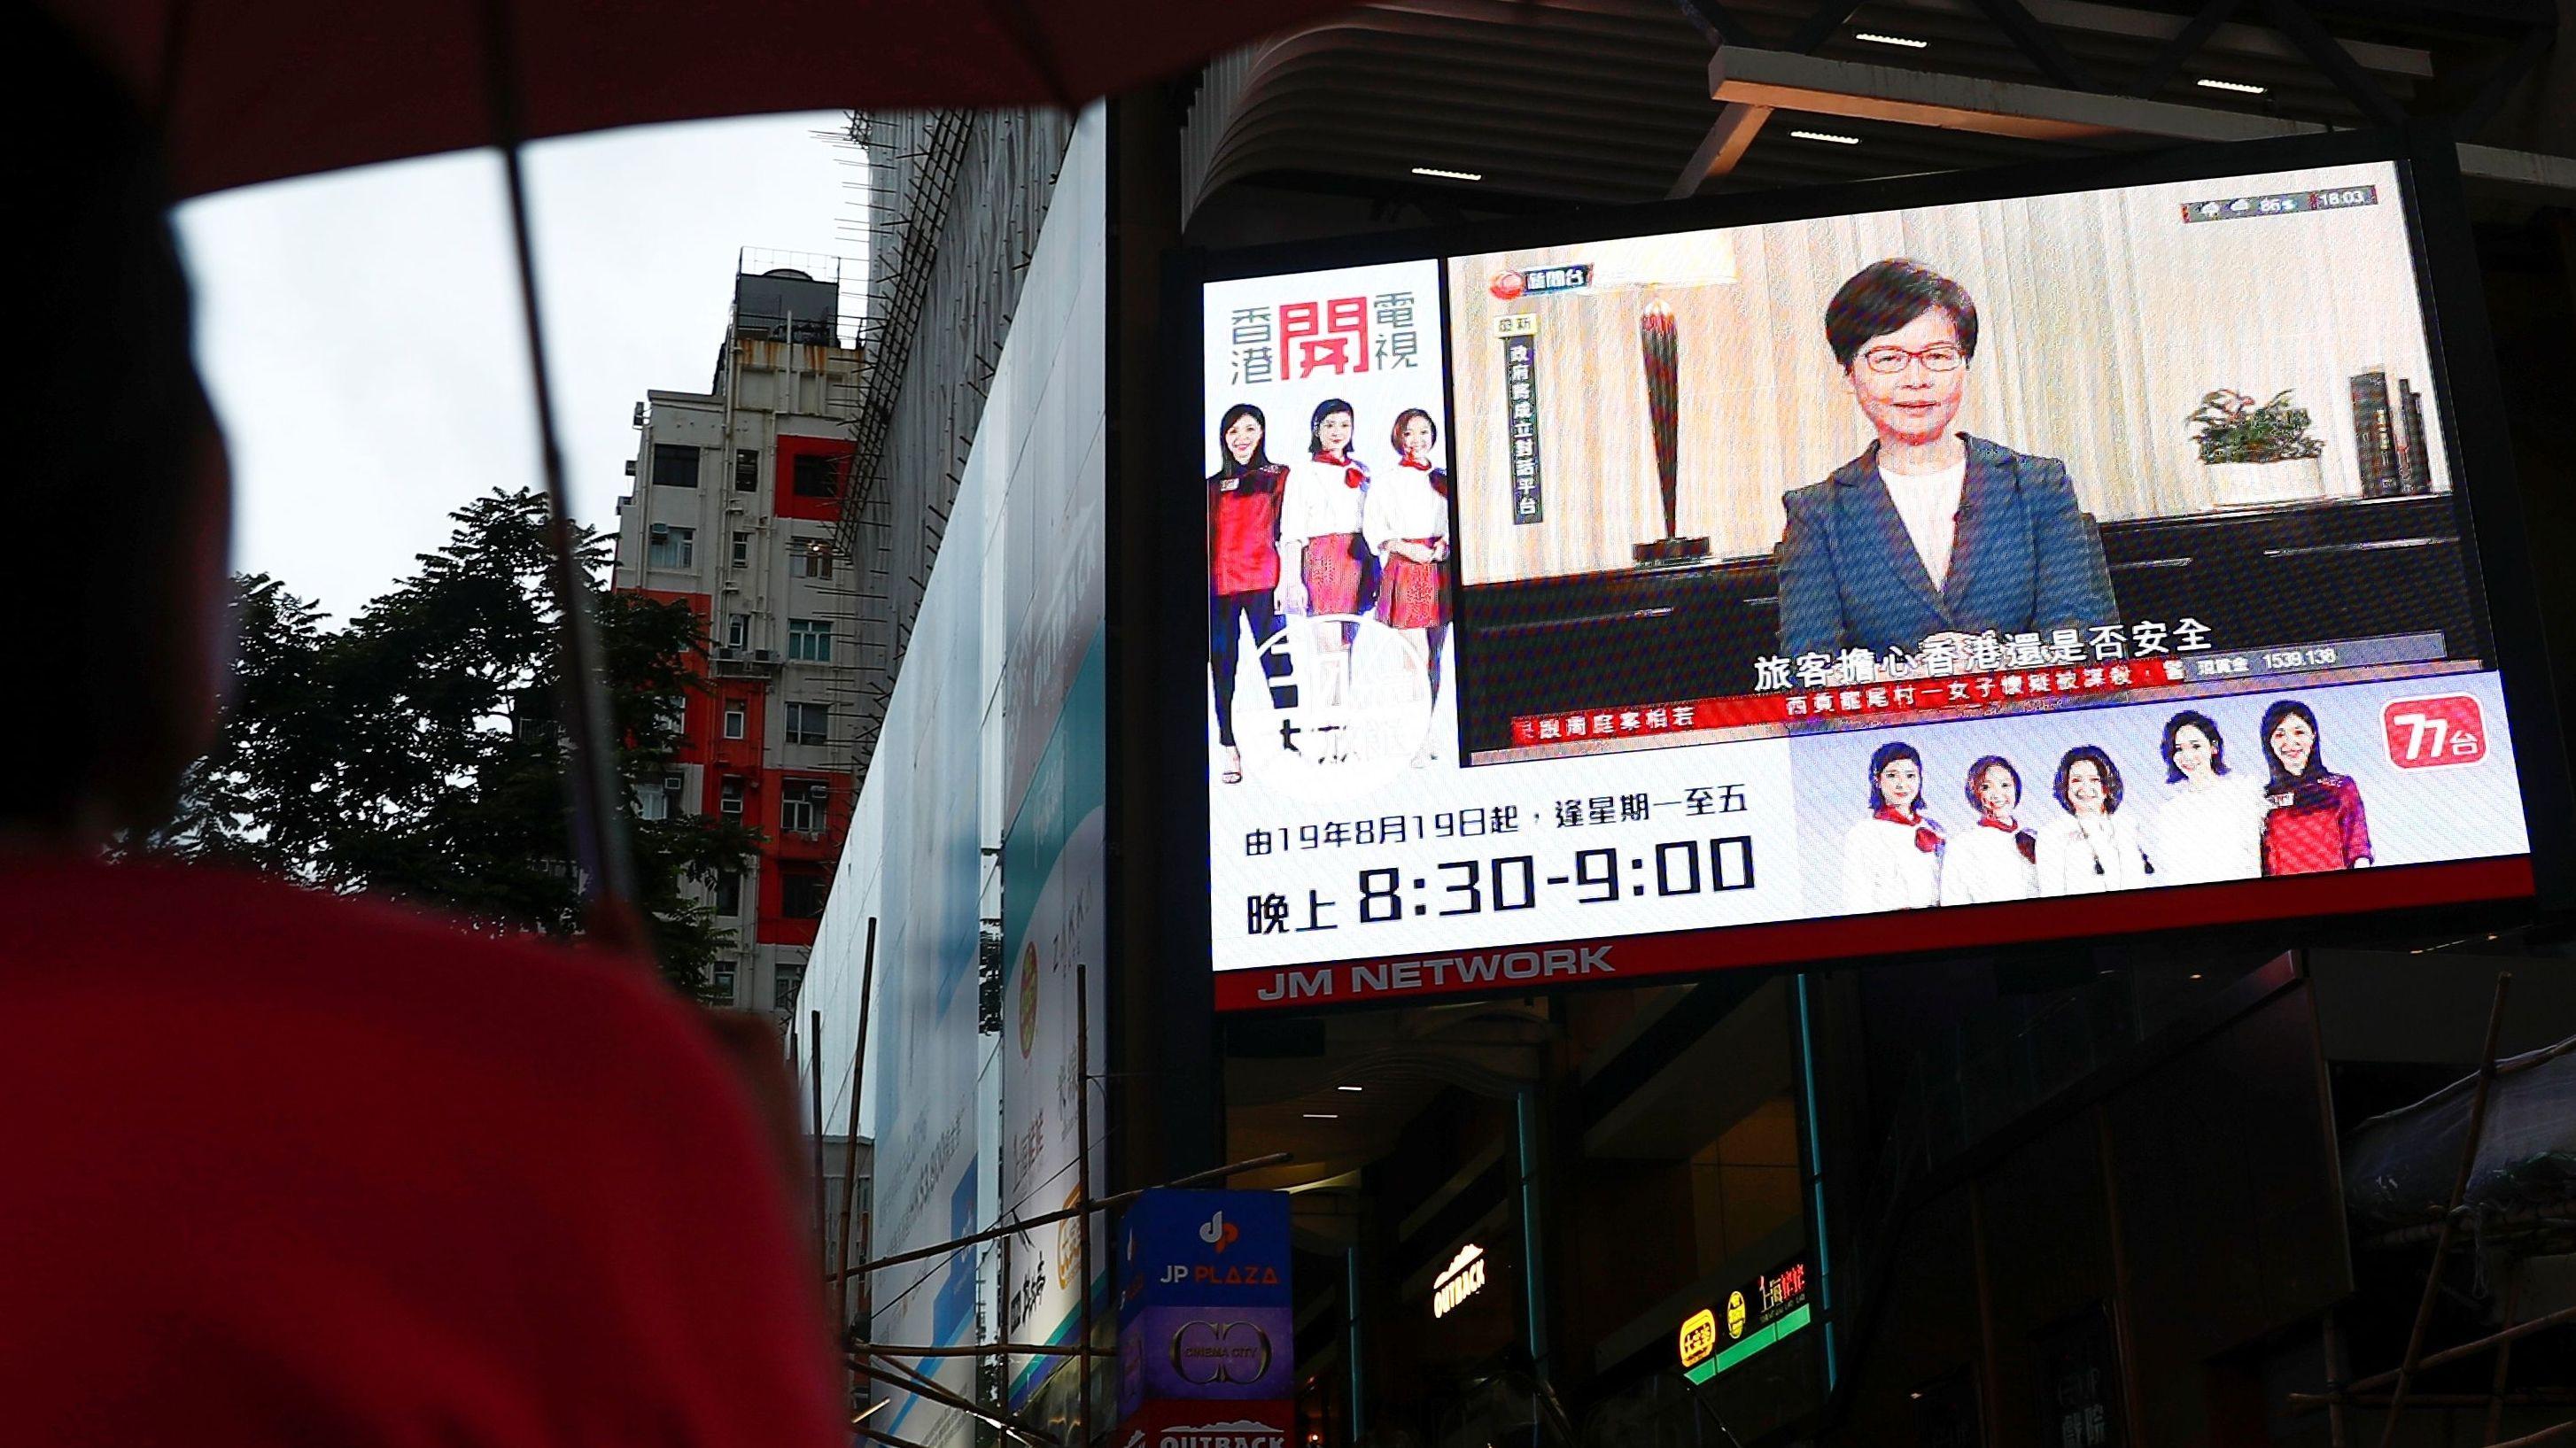 Carrie Lams Pressekonferenz auf einer Videowand in Hongkong